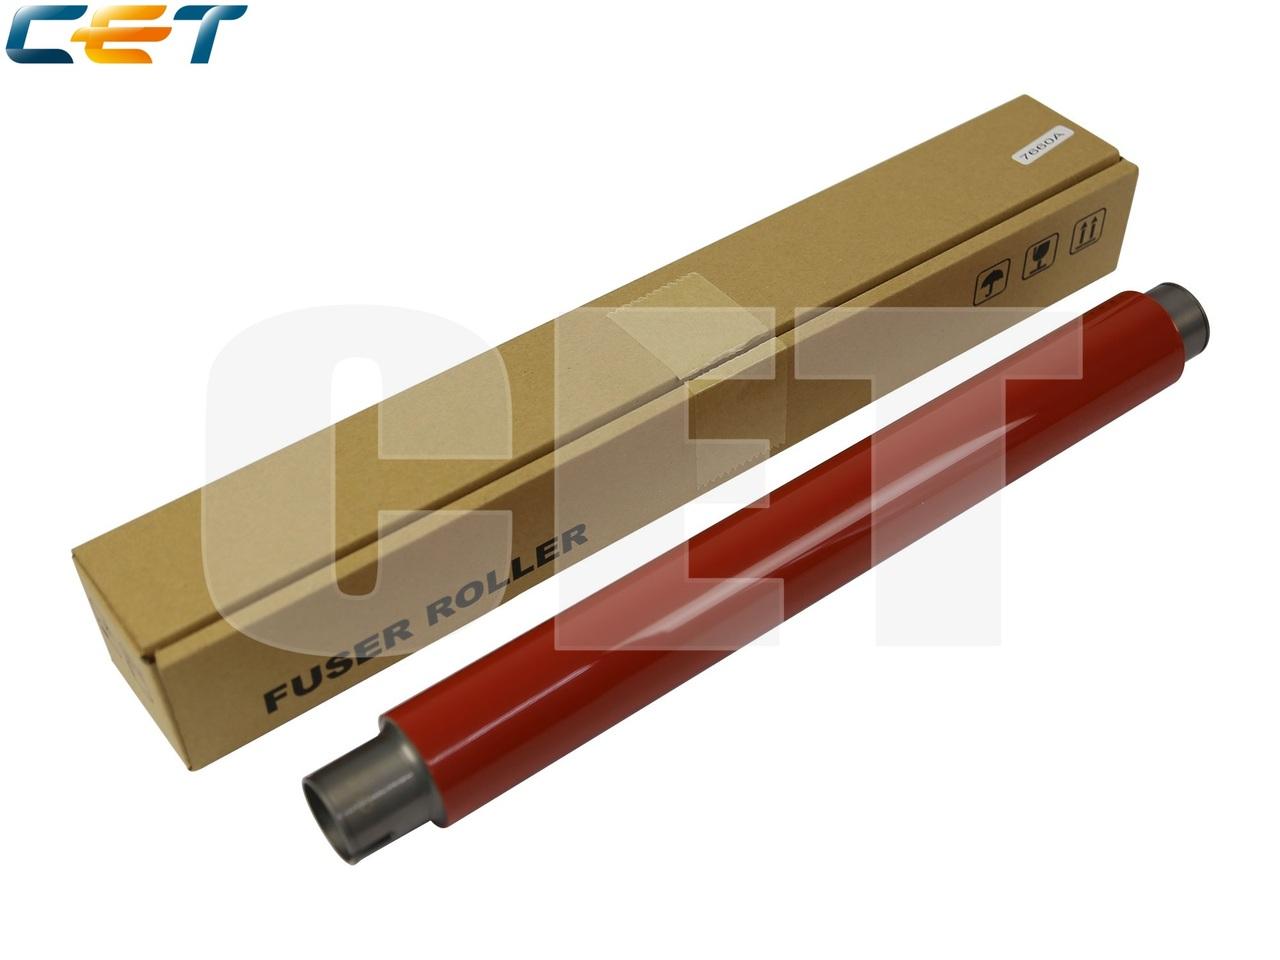 Тефлоновый вал NROLT1850FCZ1, NROLT1850FCZZ дляSHARP MX-M623N/M623U/M753N/M753U (CET), CET7660A